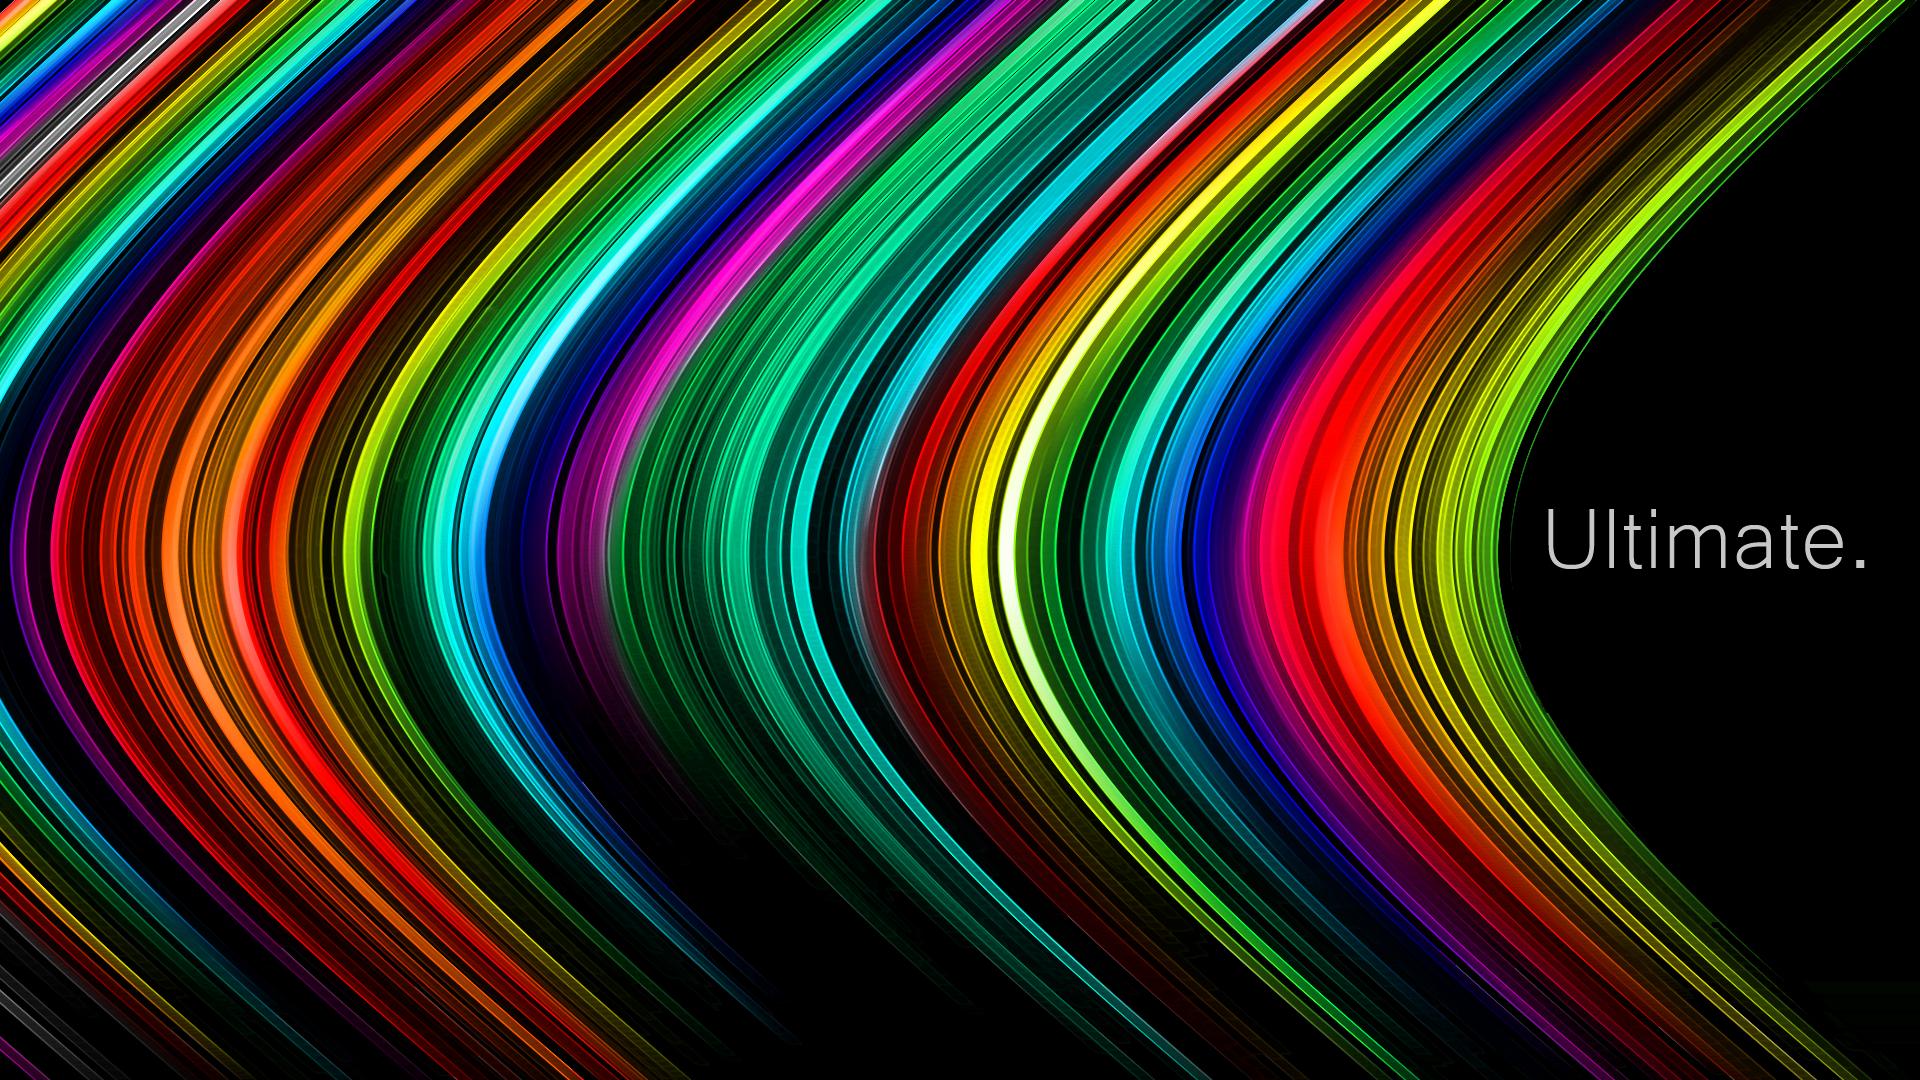 colorfull hd wallpaper 1920x1080 - photo #12